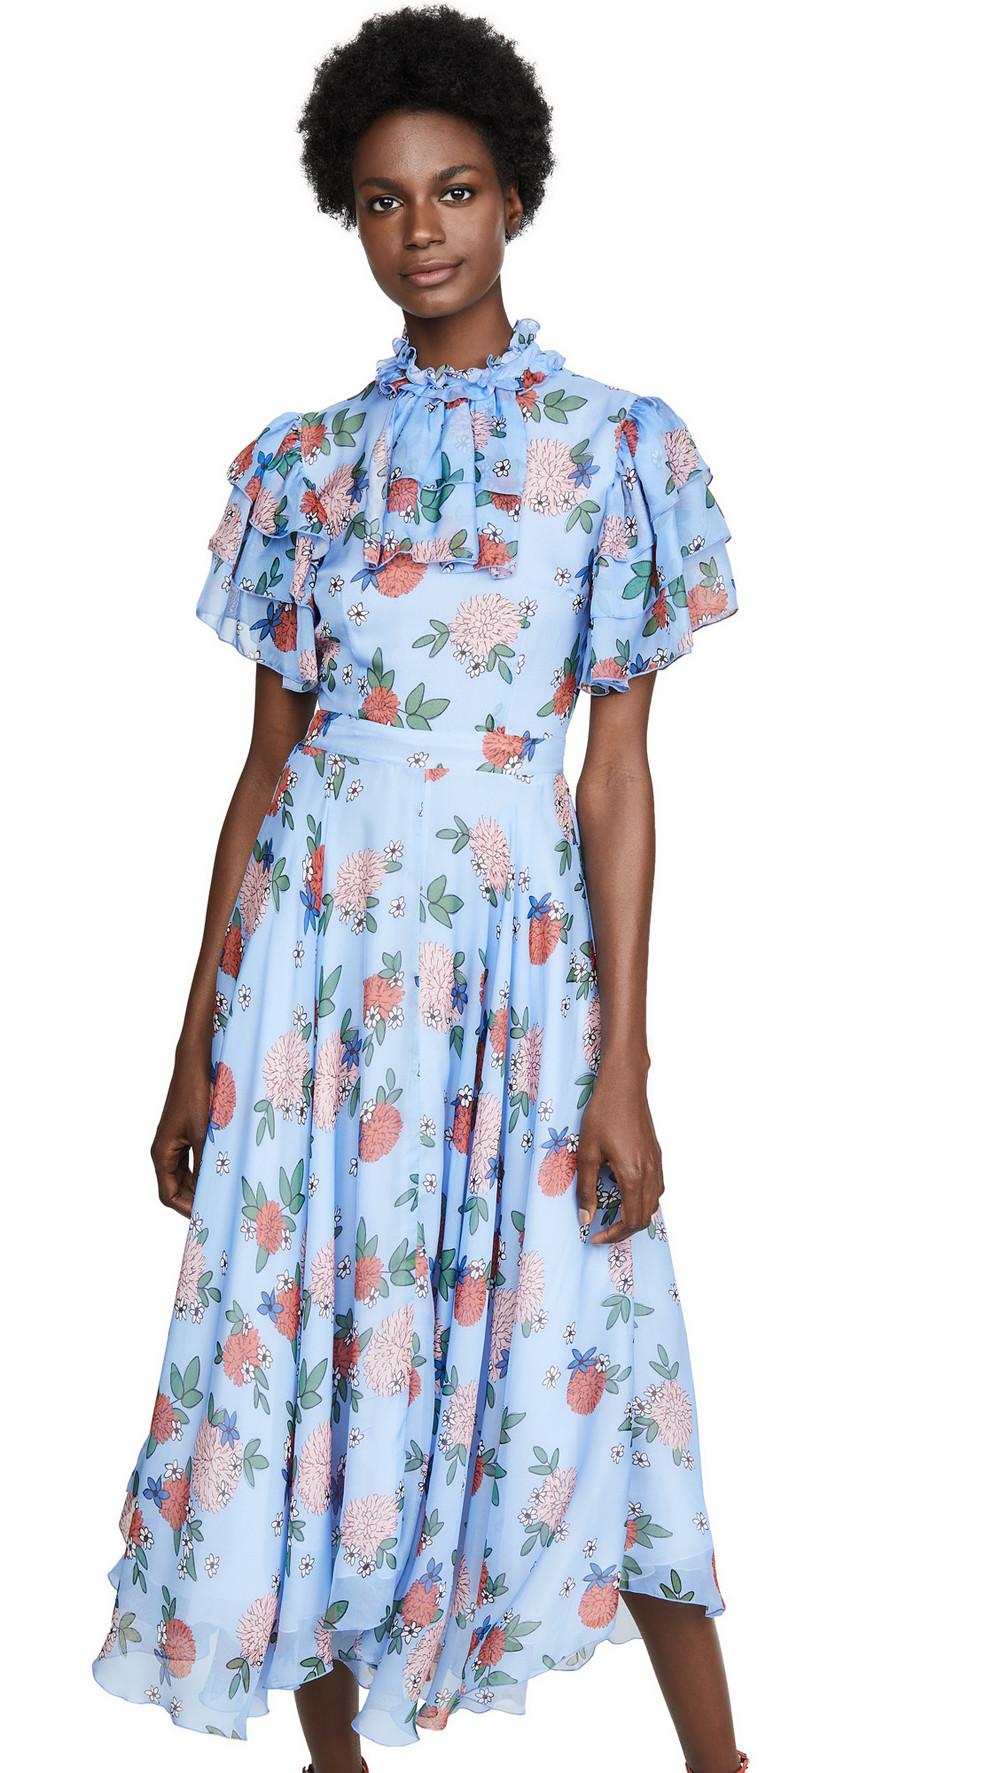 macgraw Sentimental Dress in blue